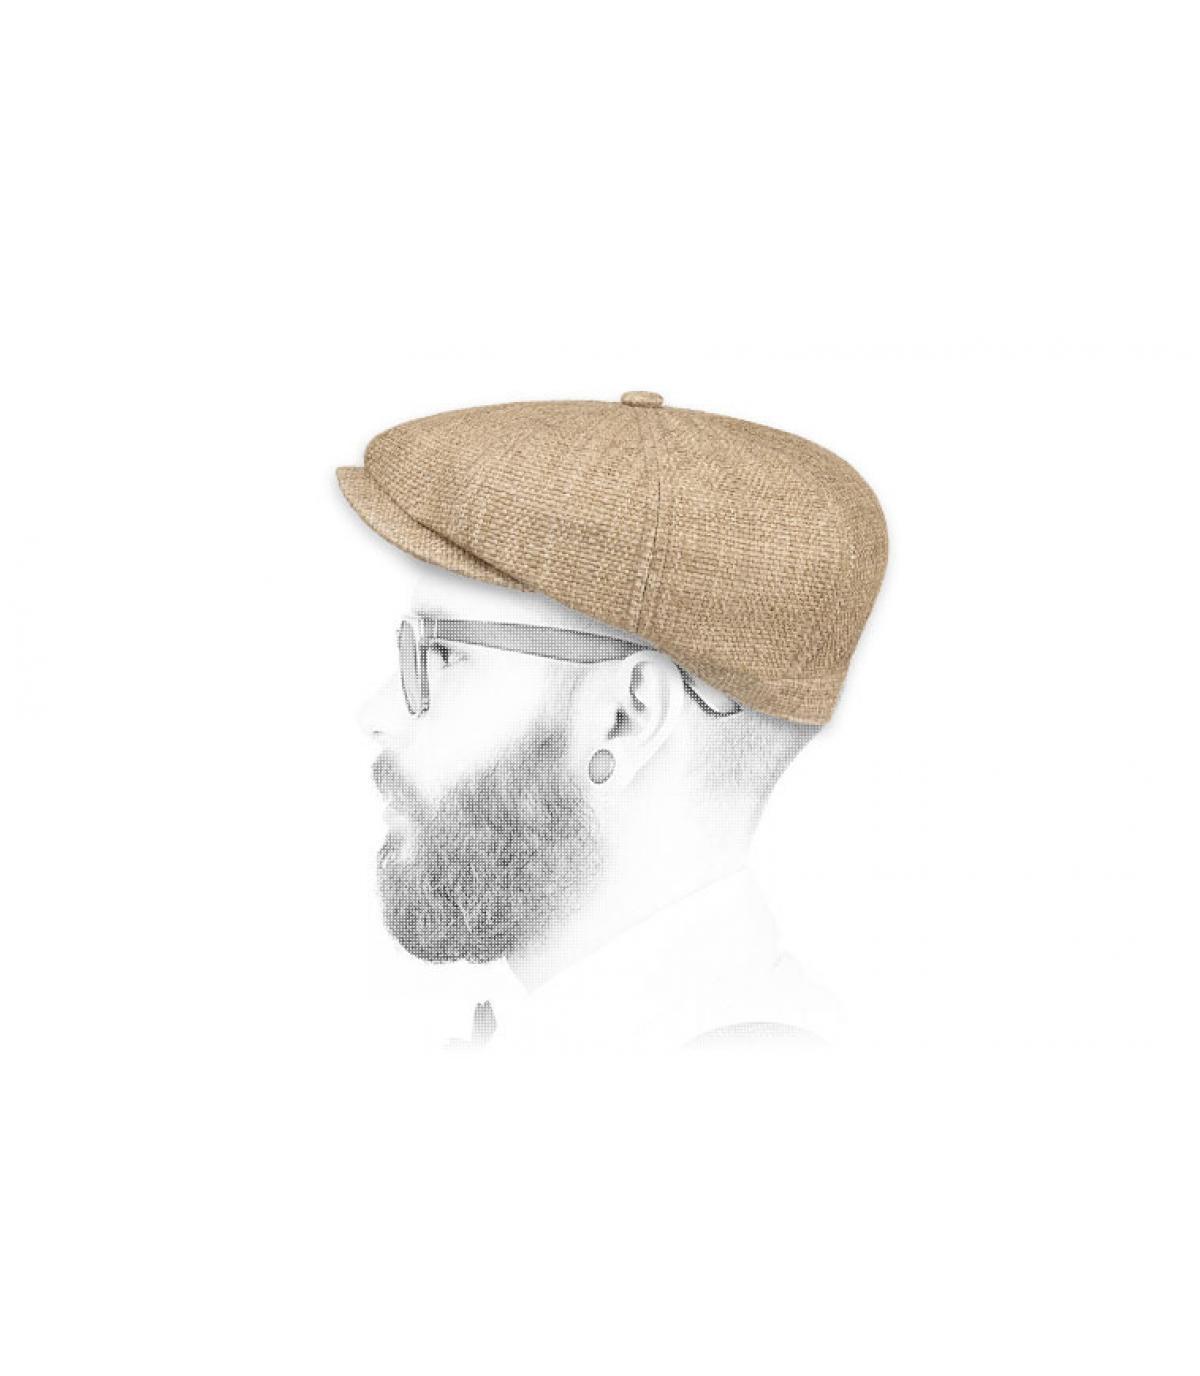 Stetson straw newsboy cap